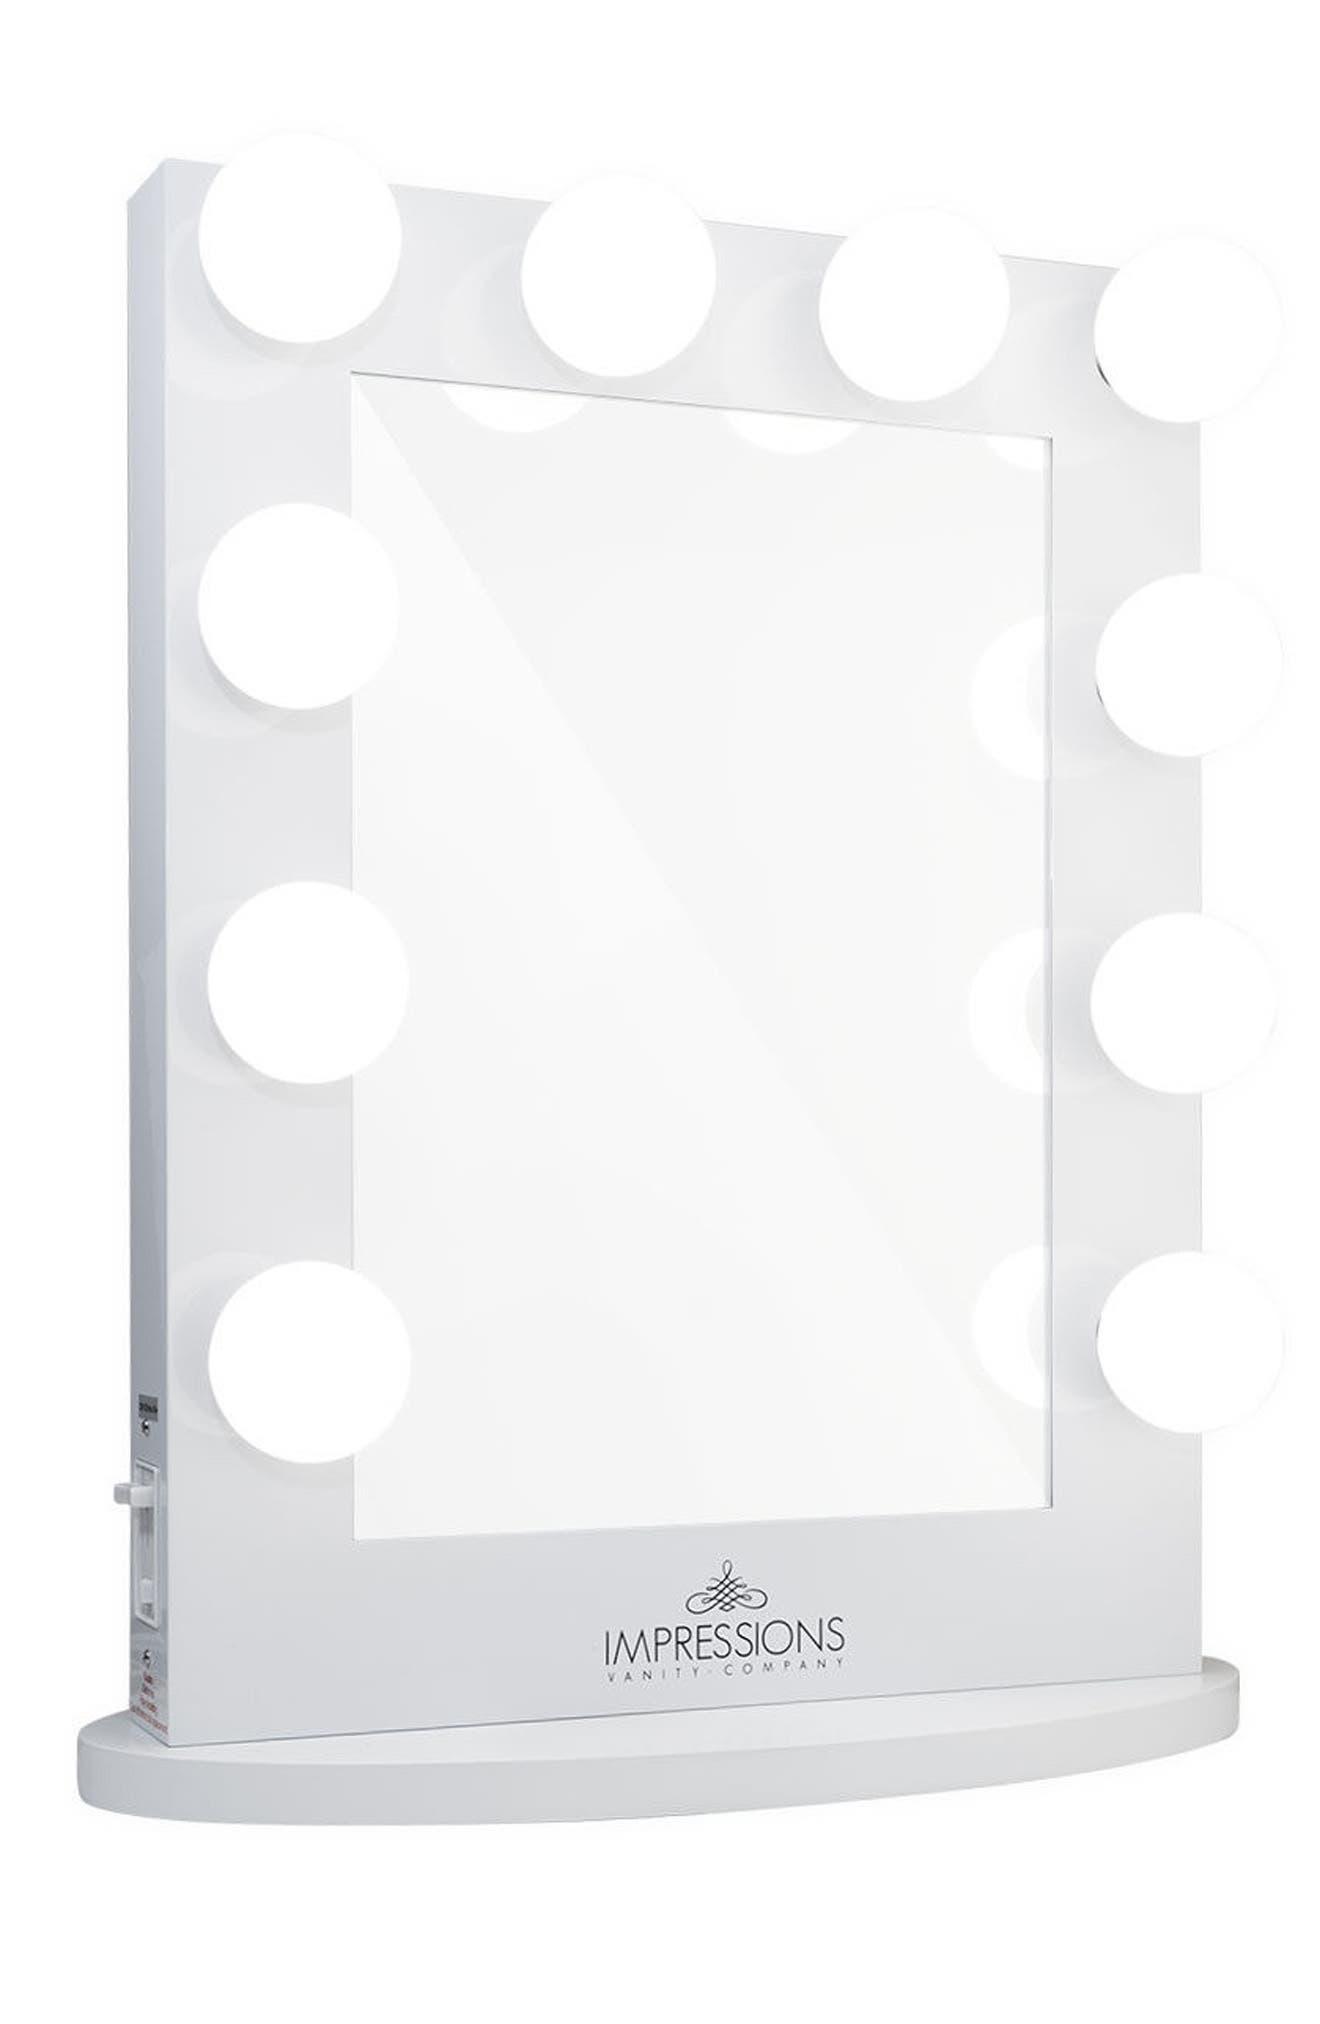 Main Image - Impressions Vanity Co. Hollywood Iconic™ Vanity Mirror